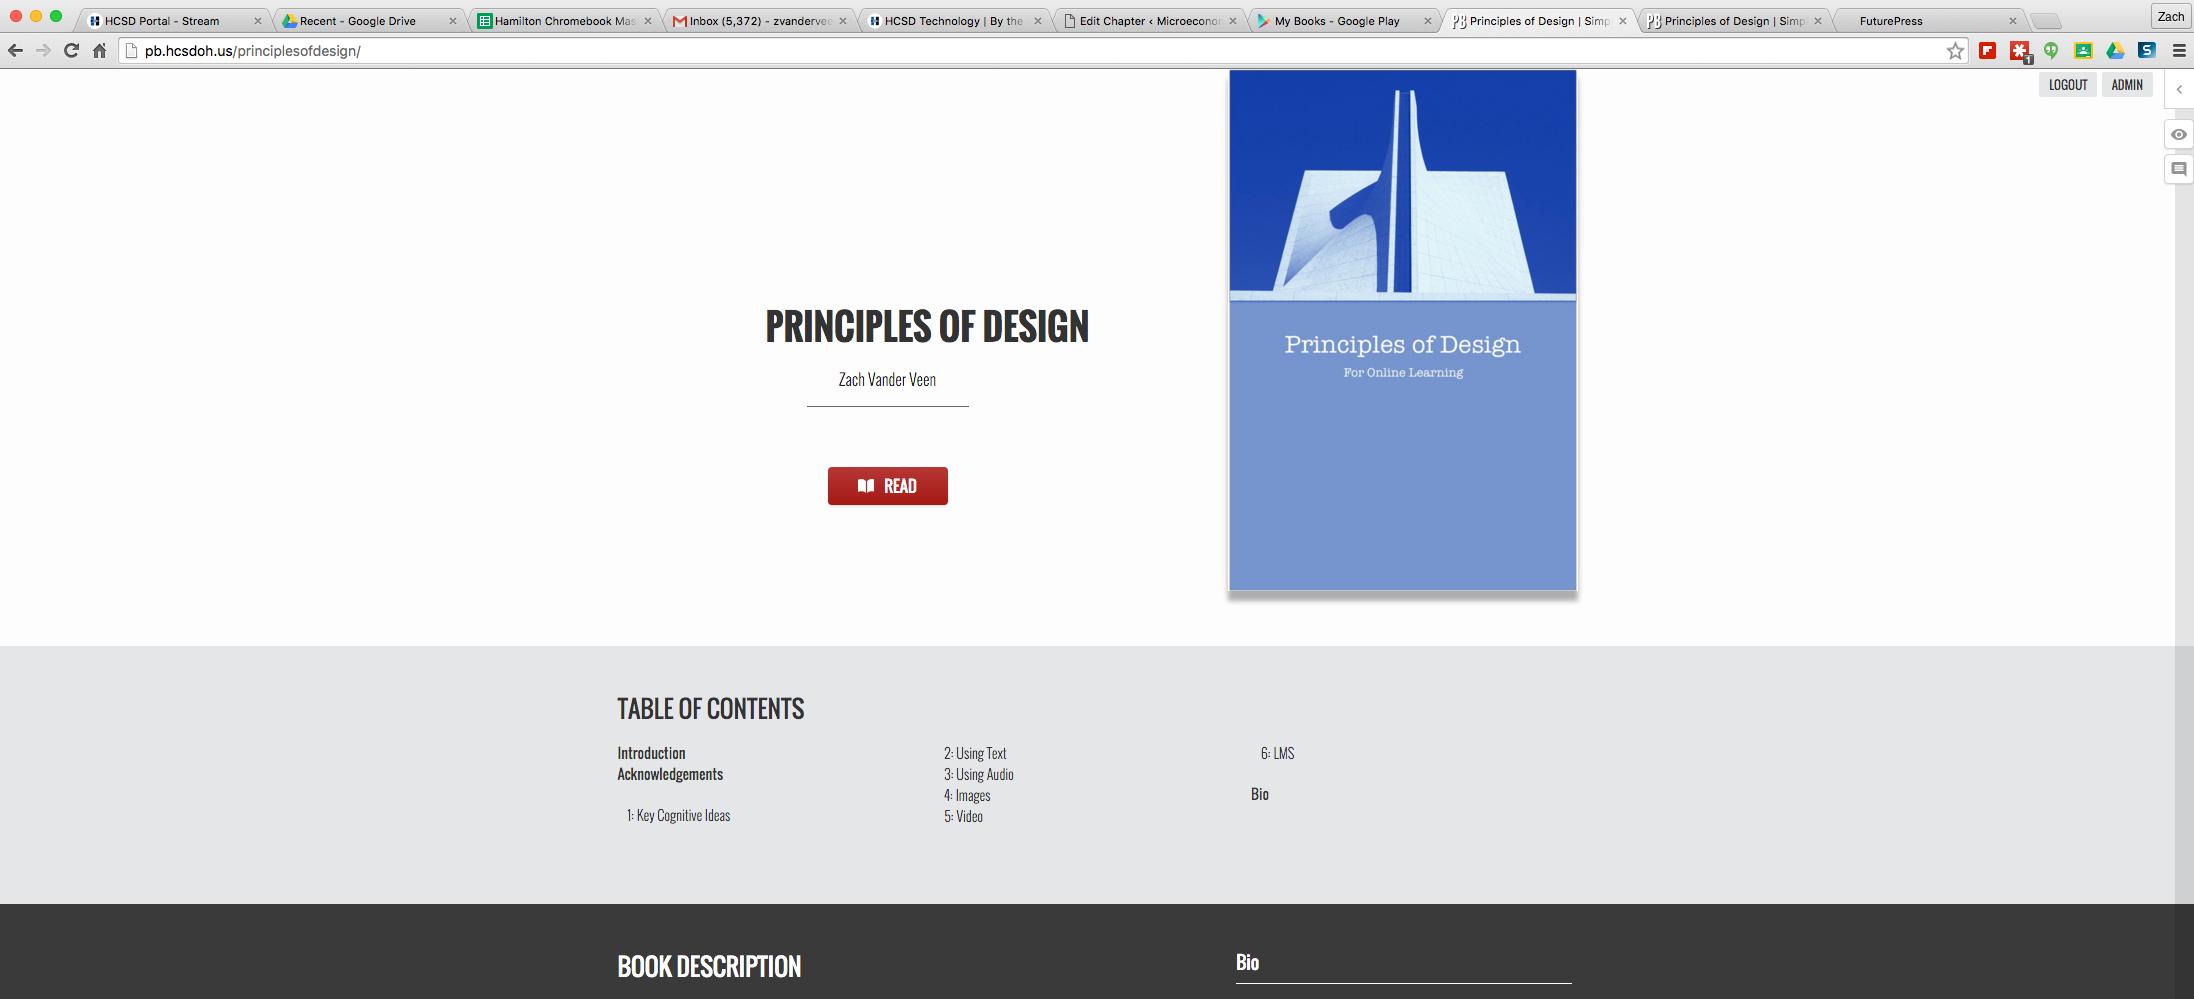 Framework for Online Textbooks – HCSD Technology